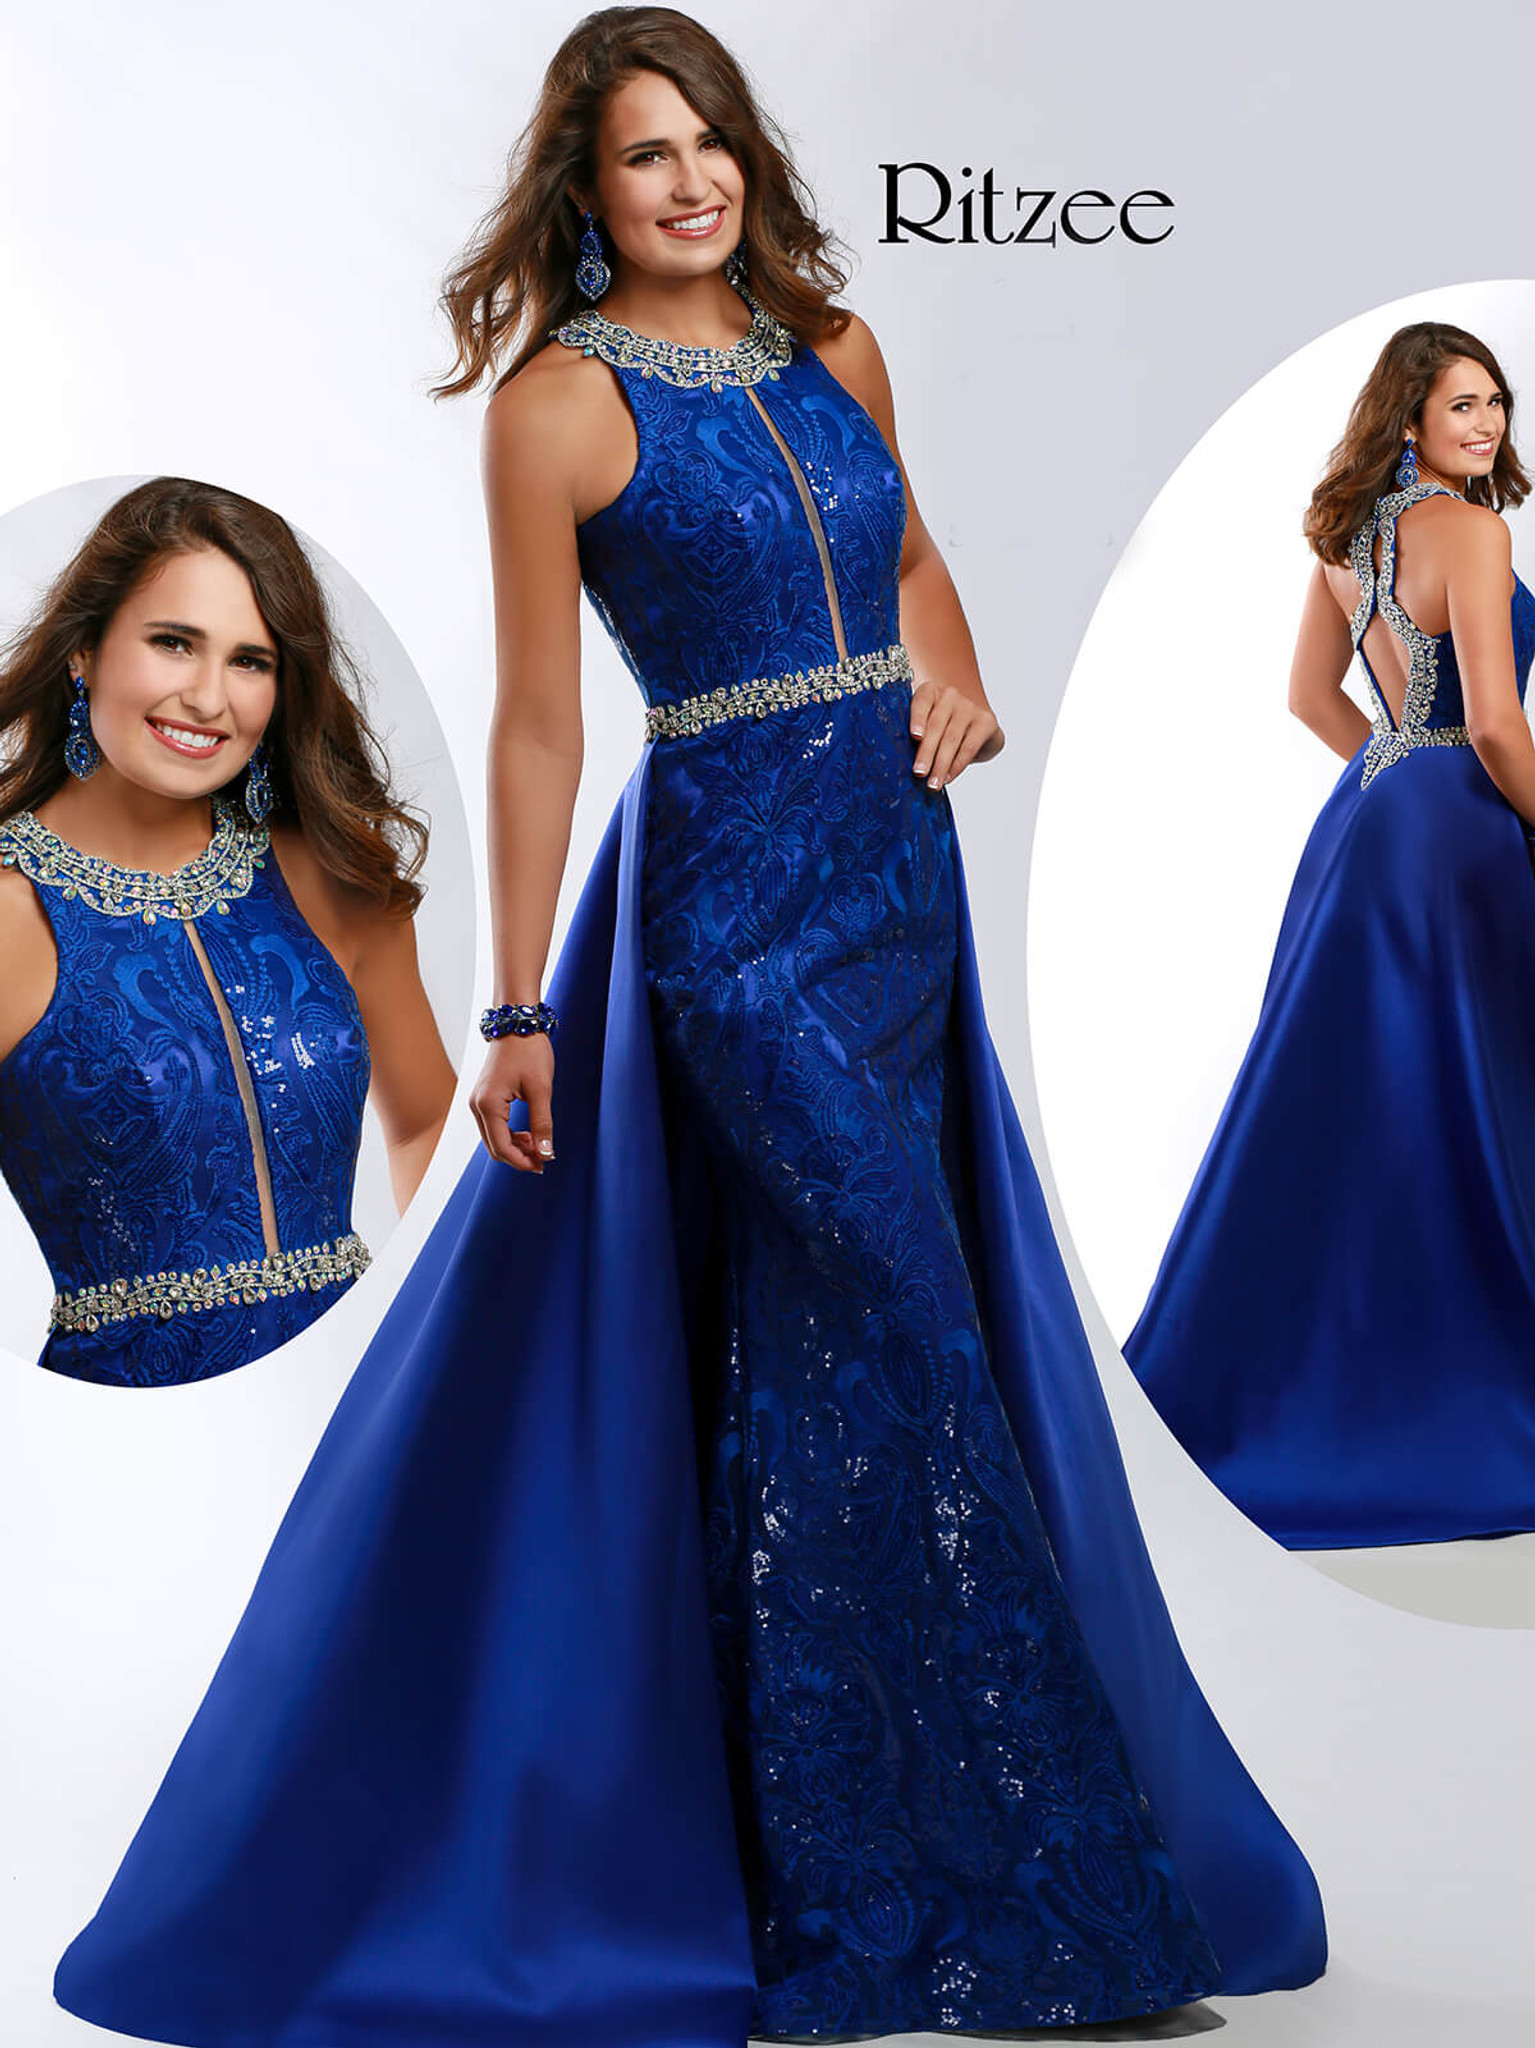 A-line Ritzee Originals 3639 Pageant Dress PageantDesigns